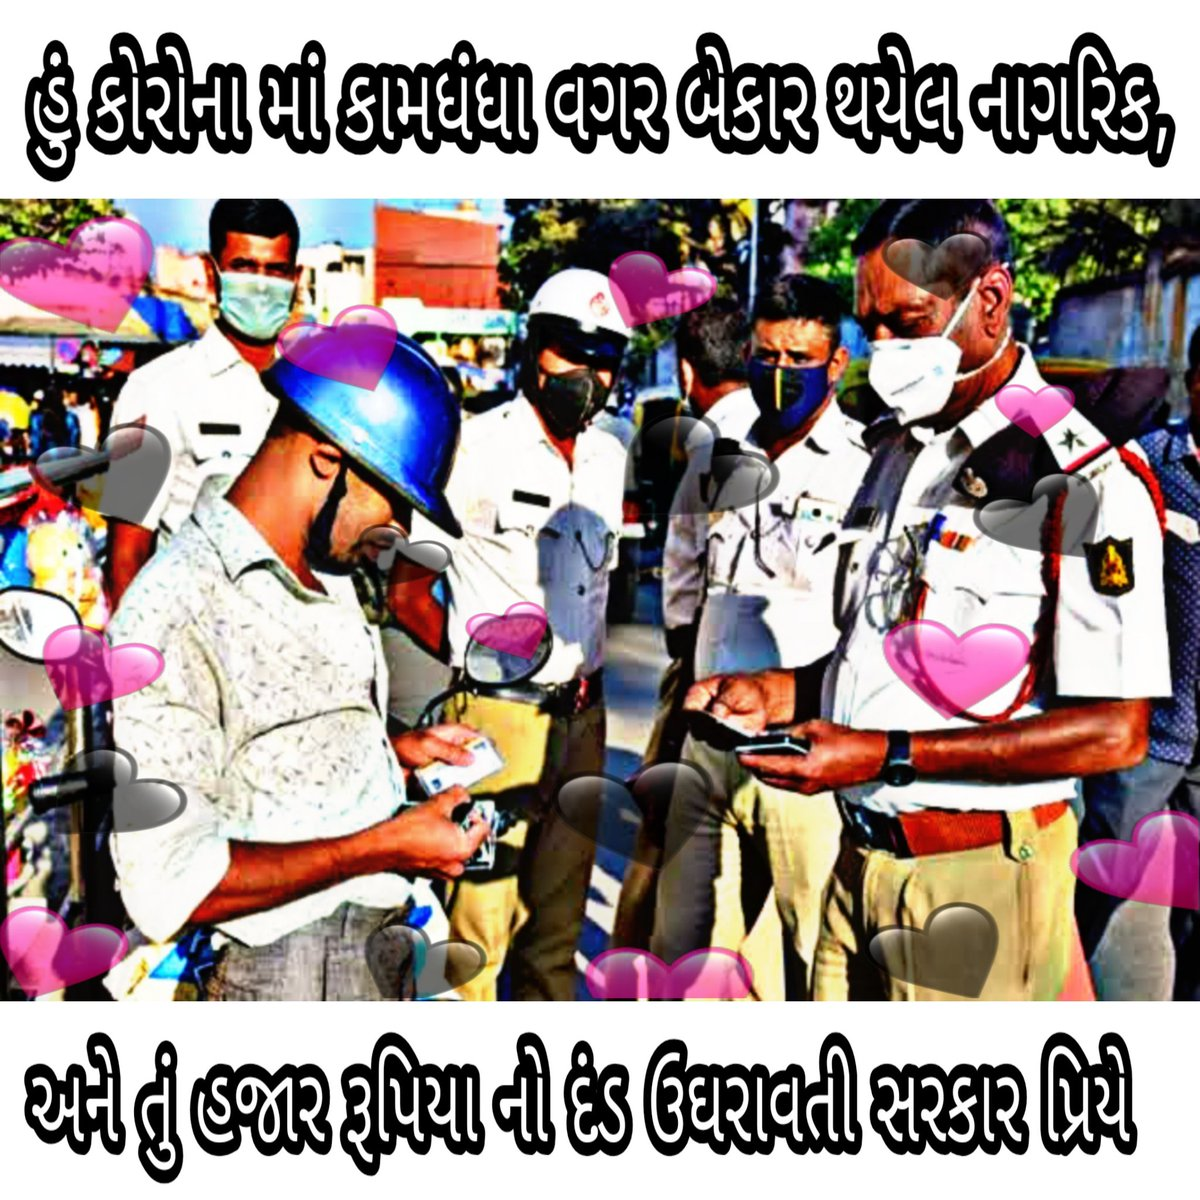 Be LoB U રૂ-પાની સલકાલ 😍🥰💓 #coronavirus #GujGovt  #1000penalty #Keepsafe #QuarantineLife #Gujarat #rupani  #Talkoftheday #meme